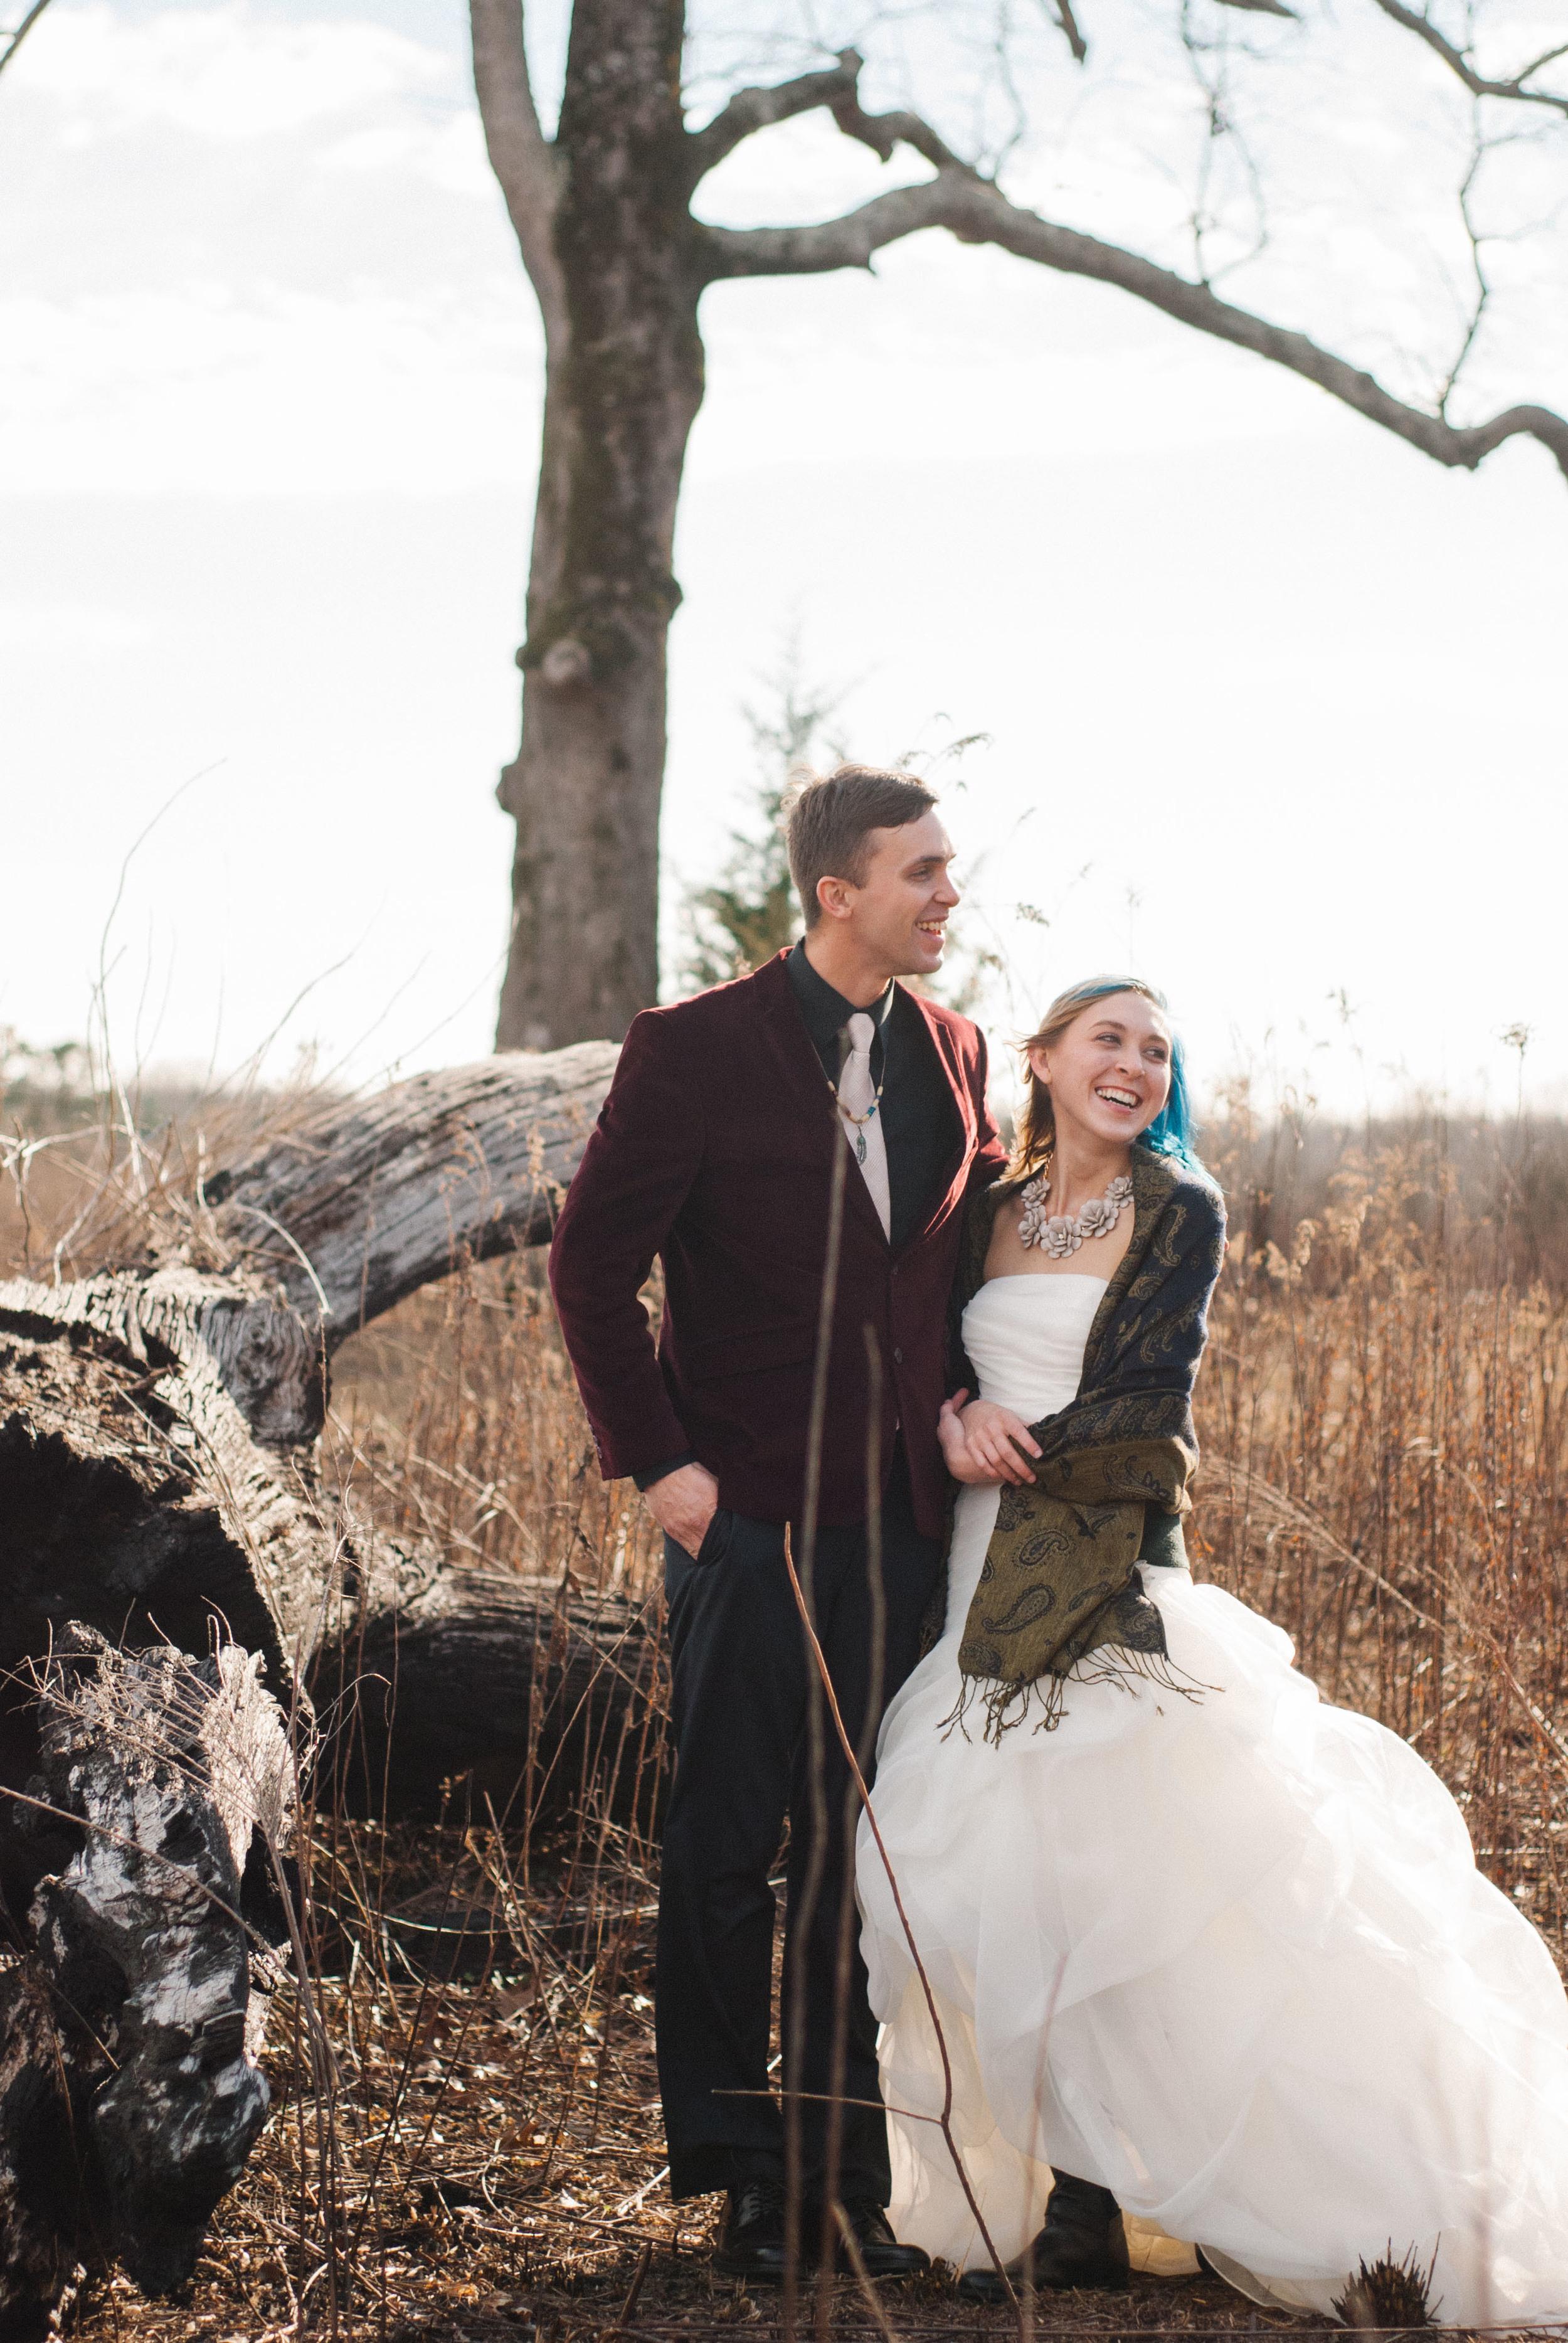 2016 Wedding - Peter + Danielle-28.jpg